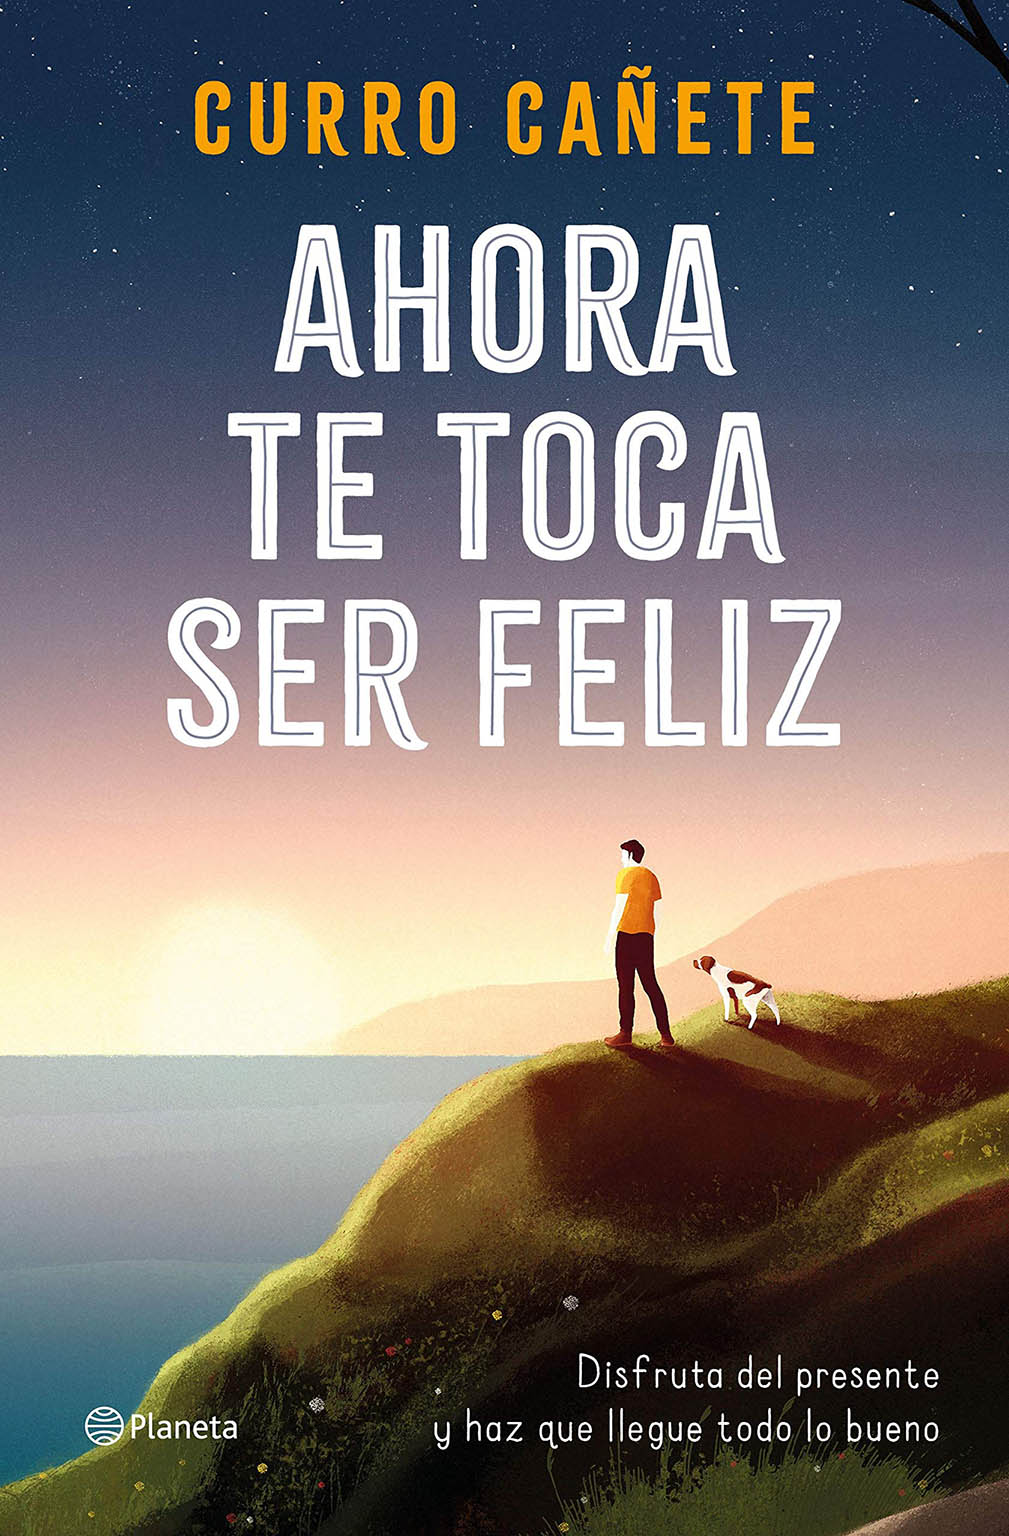 Ahora te toca ser feliz (Curro Cañete, 2020)